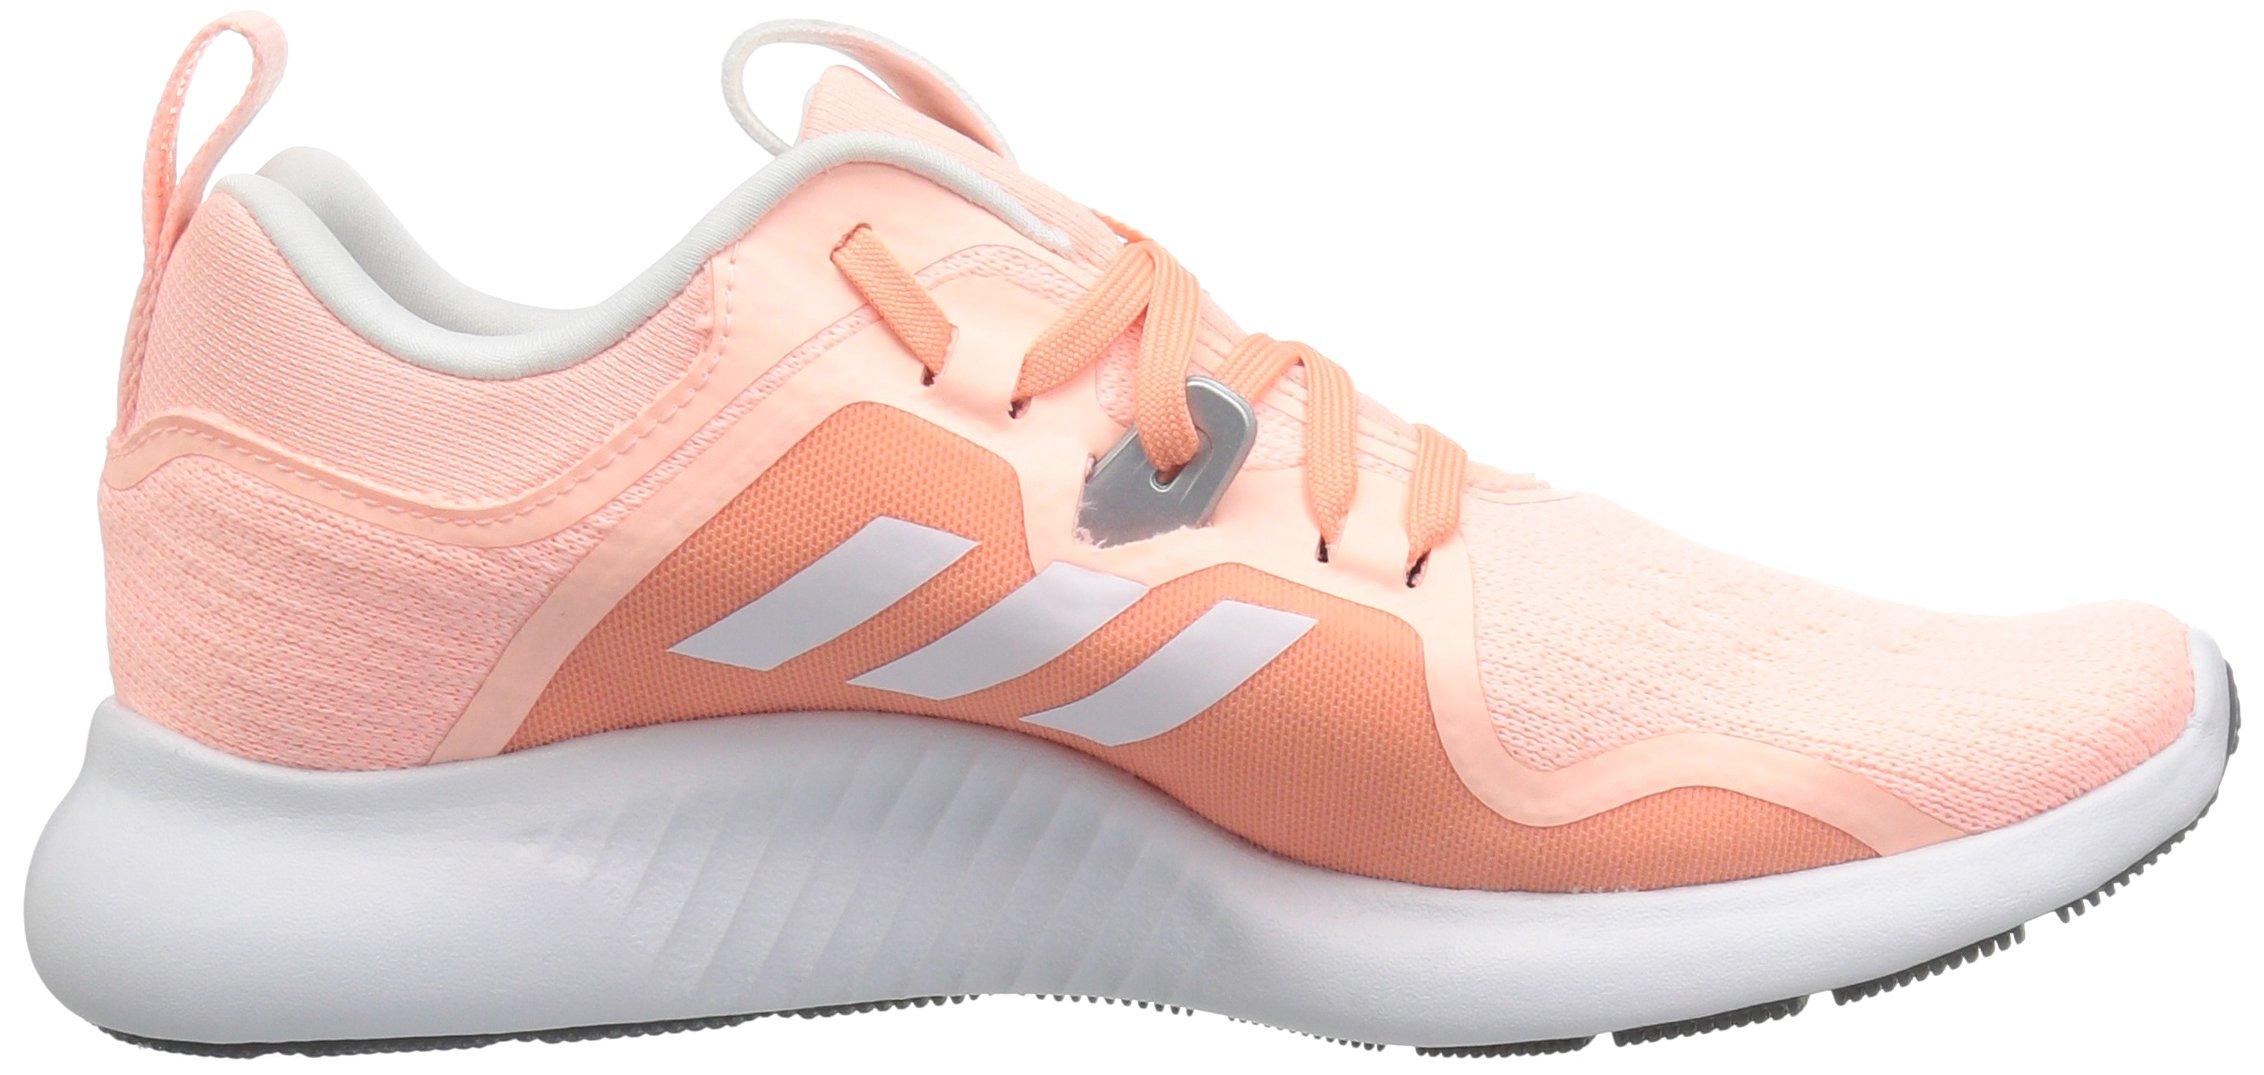 adidas Women's EdgeBounce Running Shoe Clear Orange/White/Copper Metallic 5 M US by adidas (Image #6)